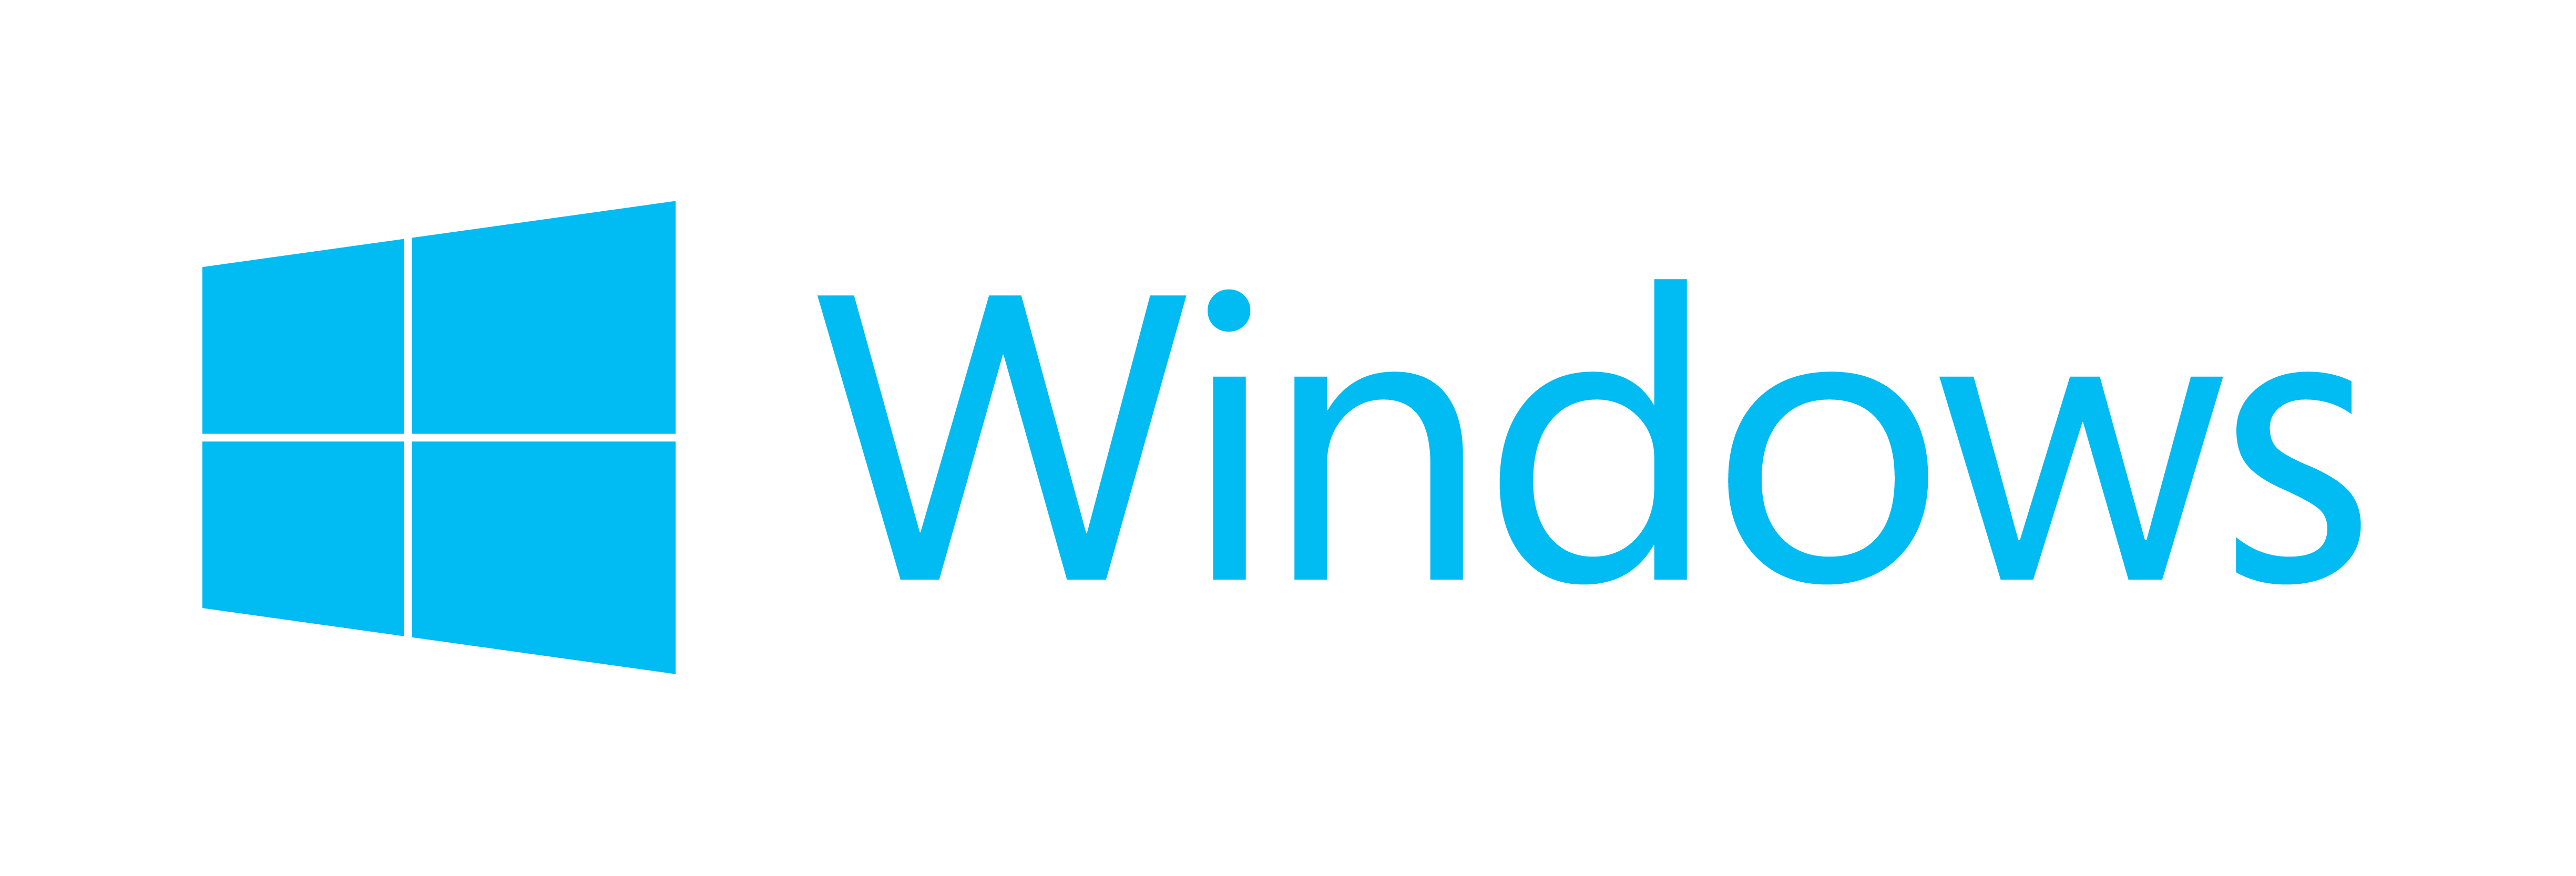 Microsoft Windows PNG - 36410